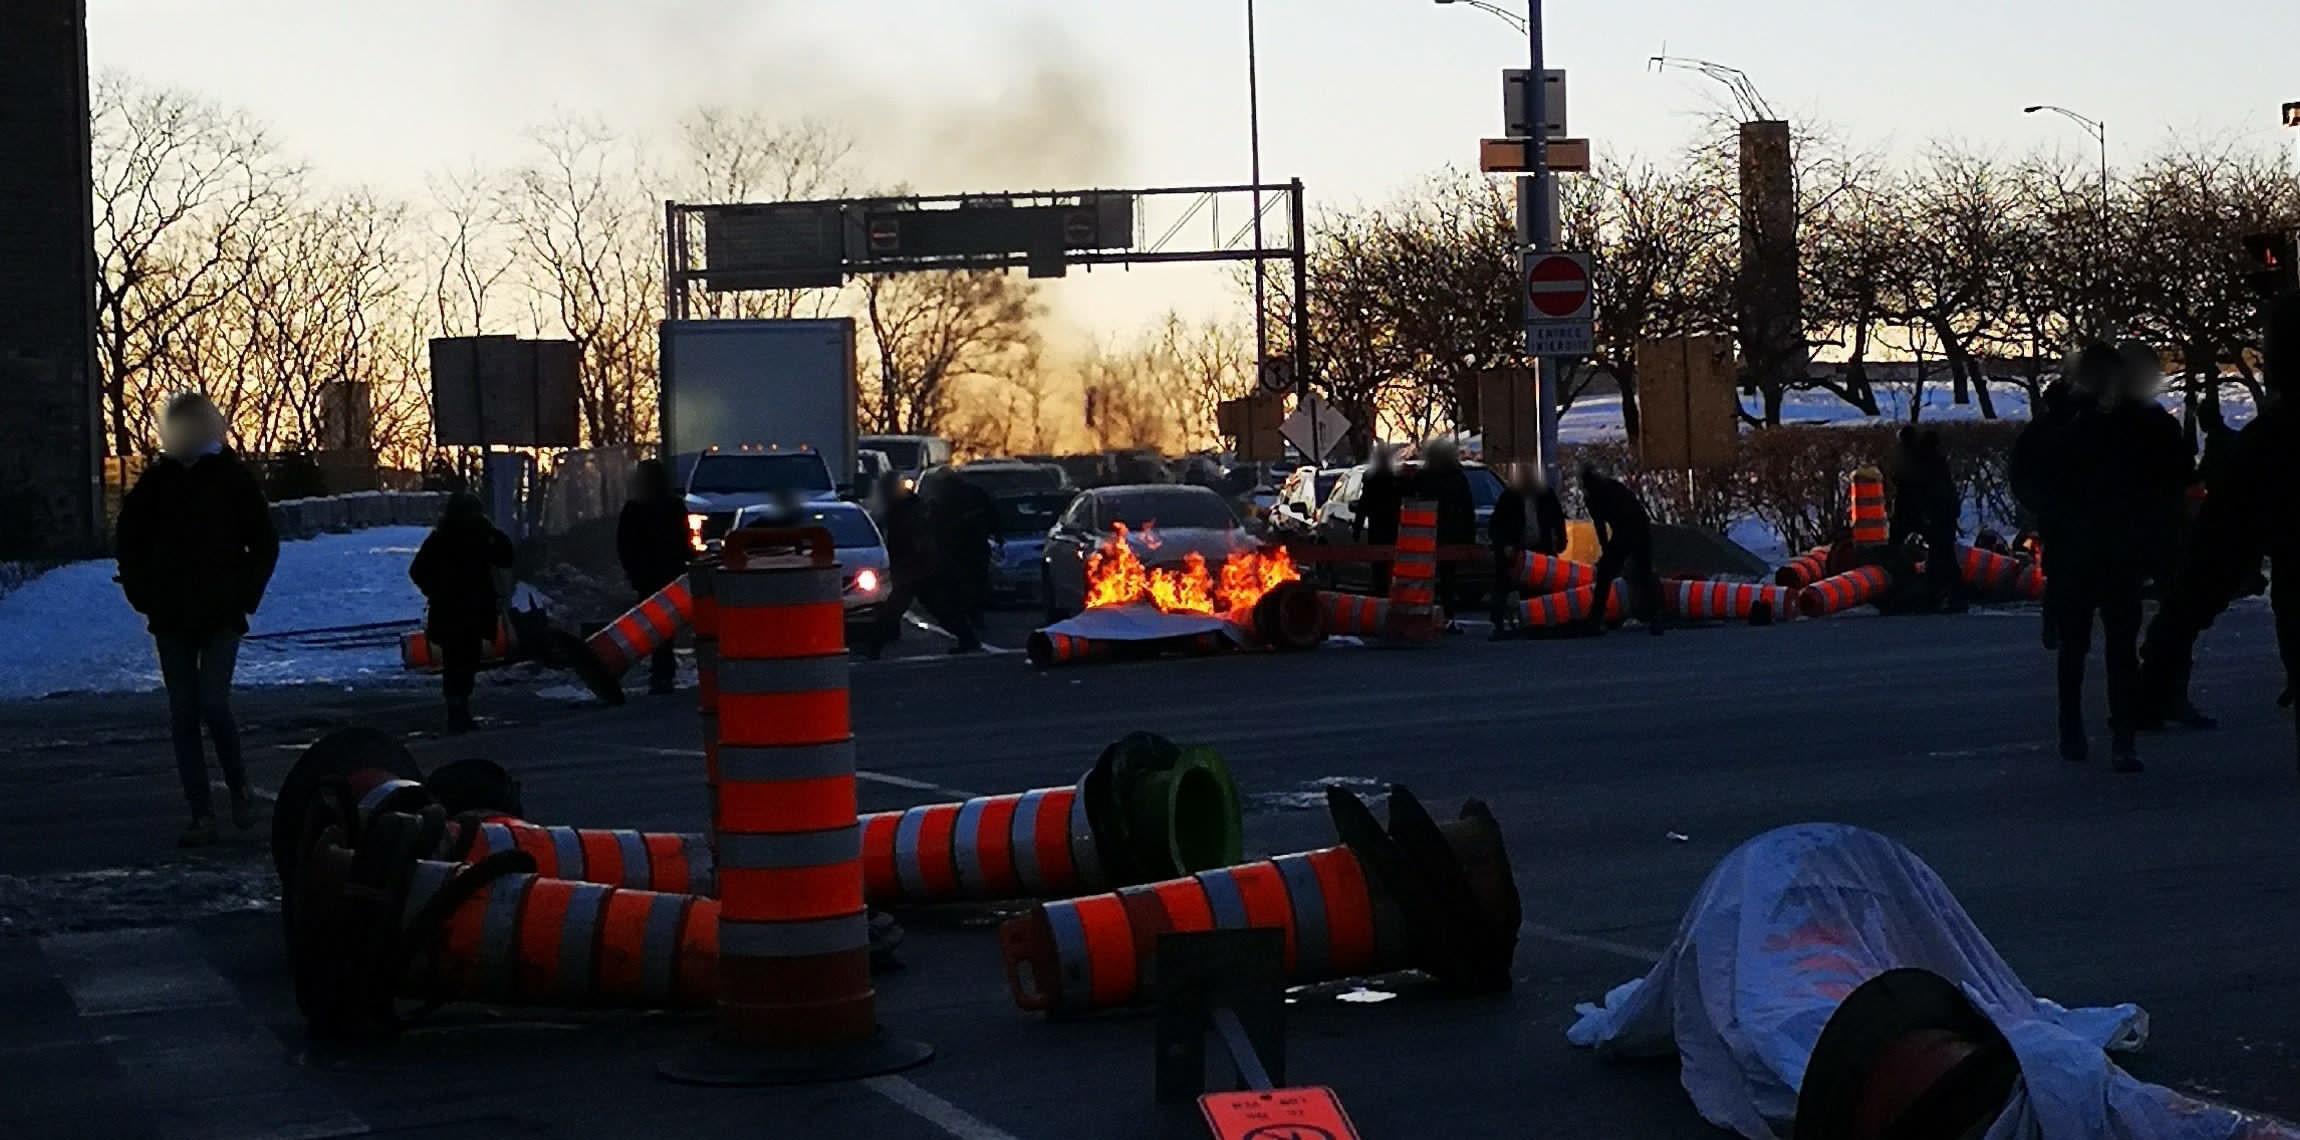 [Video] Autoroute 720 Exit Blocked in Montreal in Support of the Wet'suwet'en